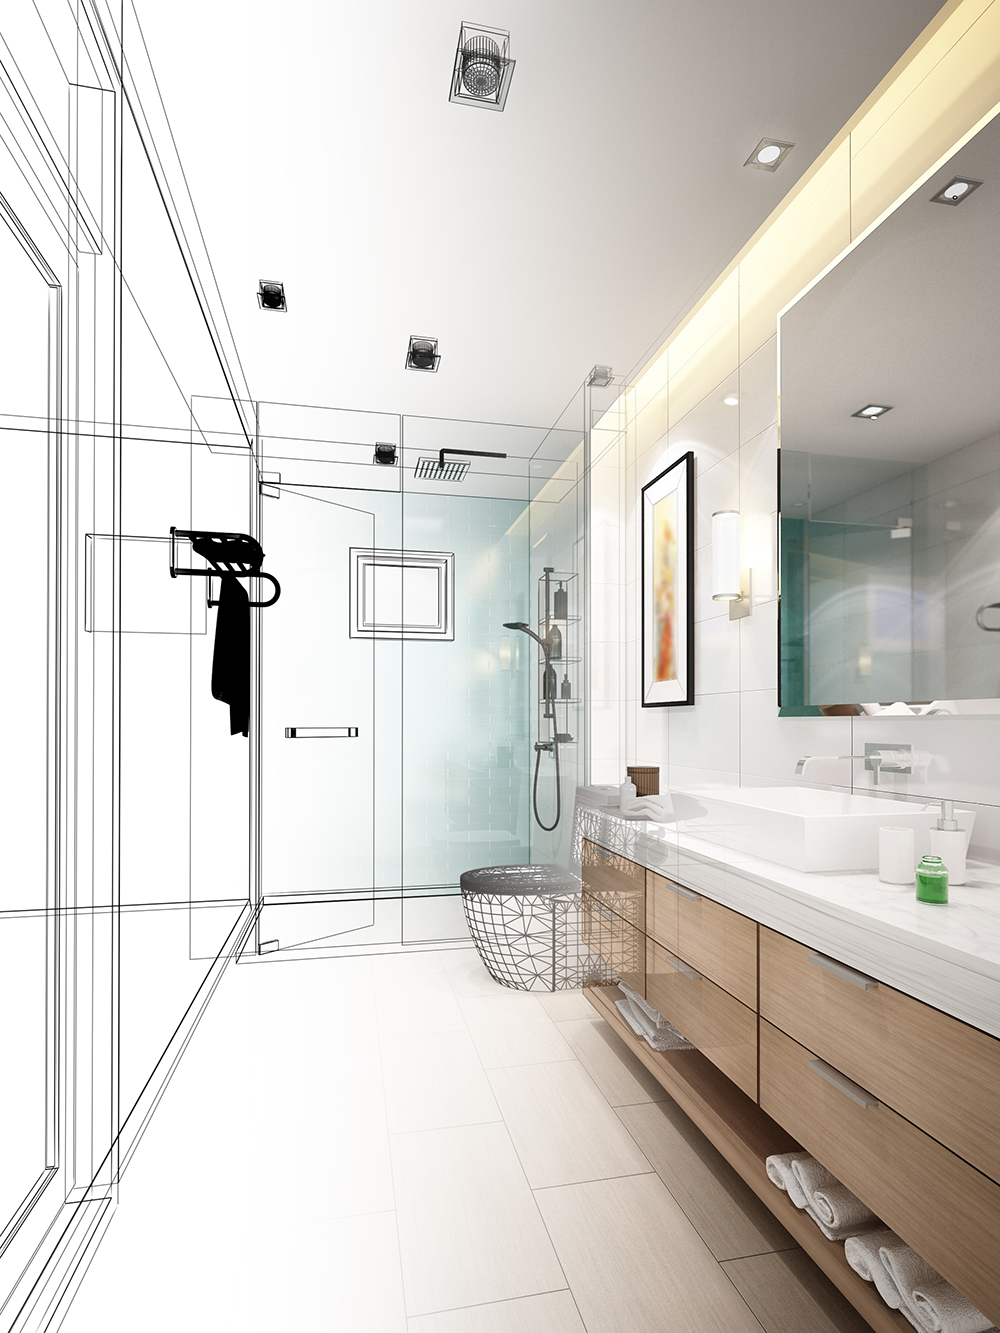 bathroom-sketch-render